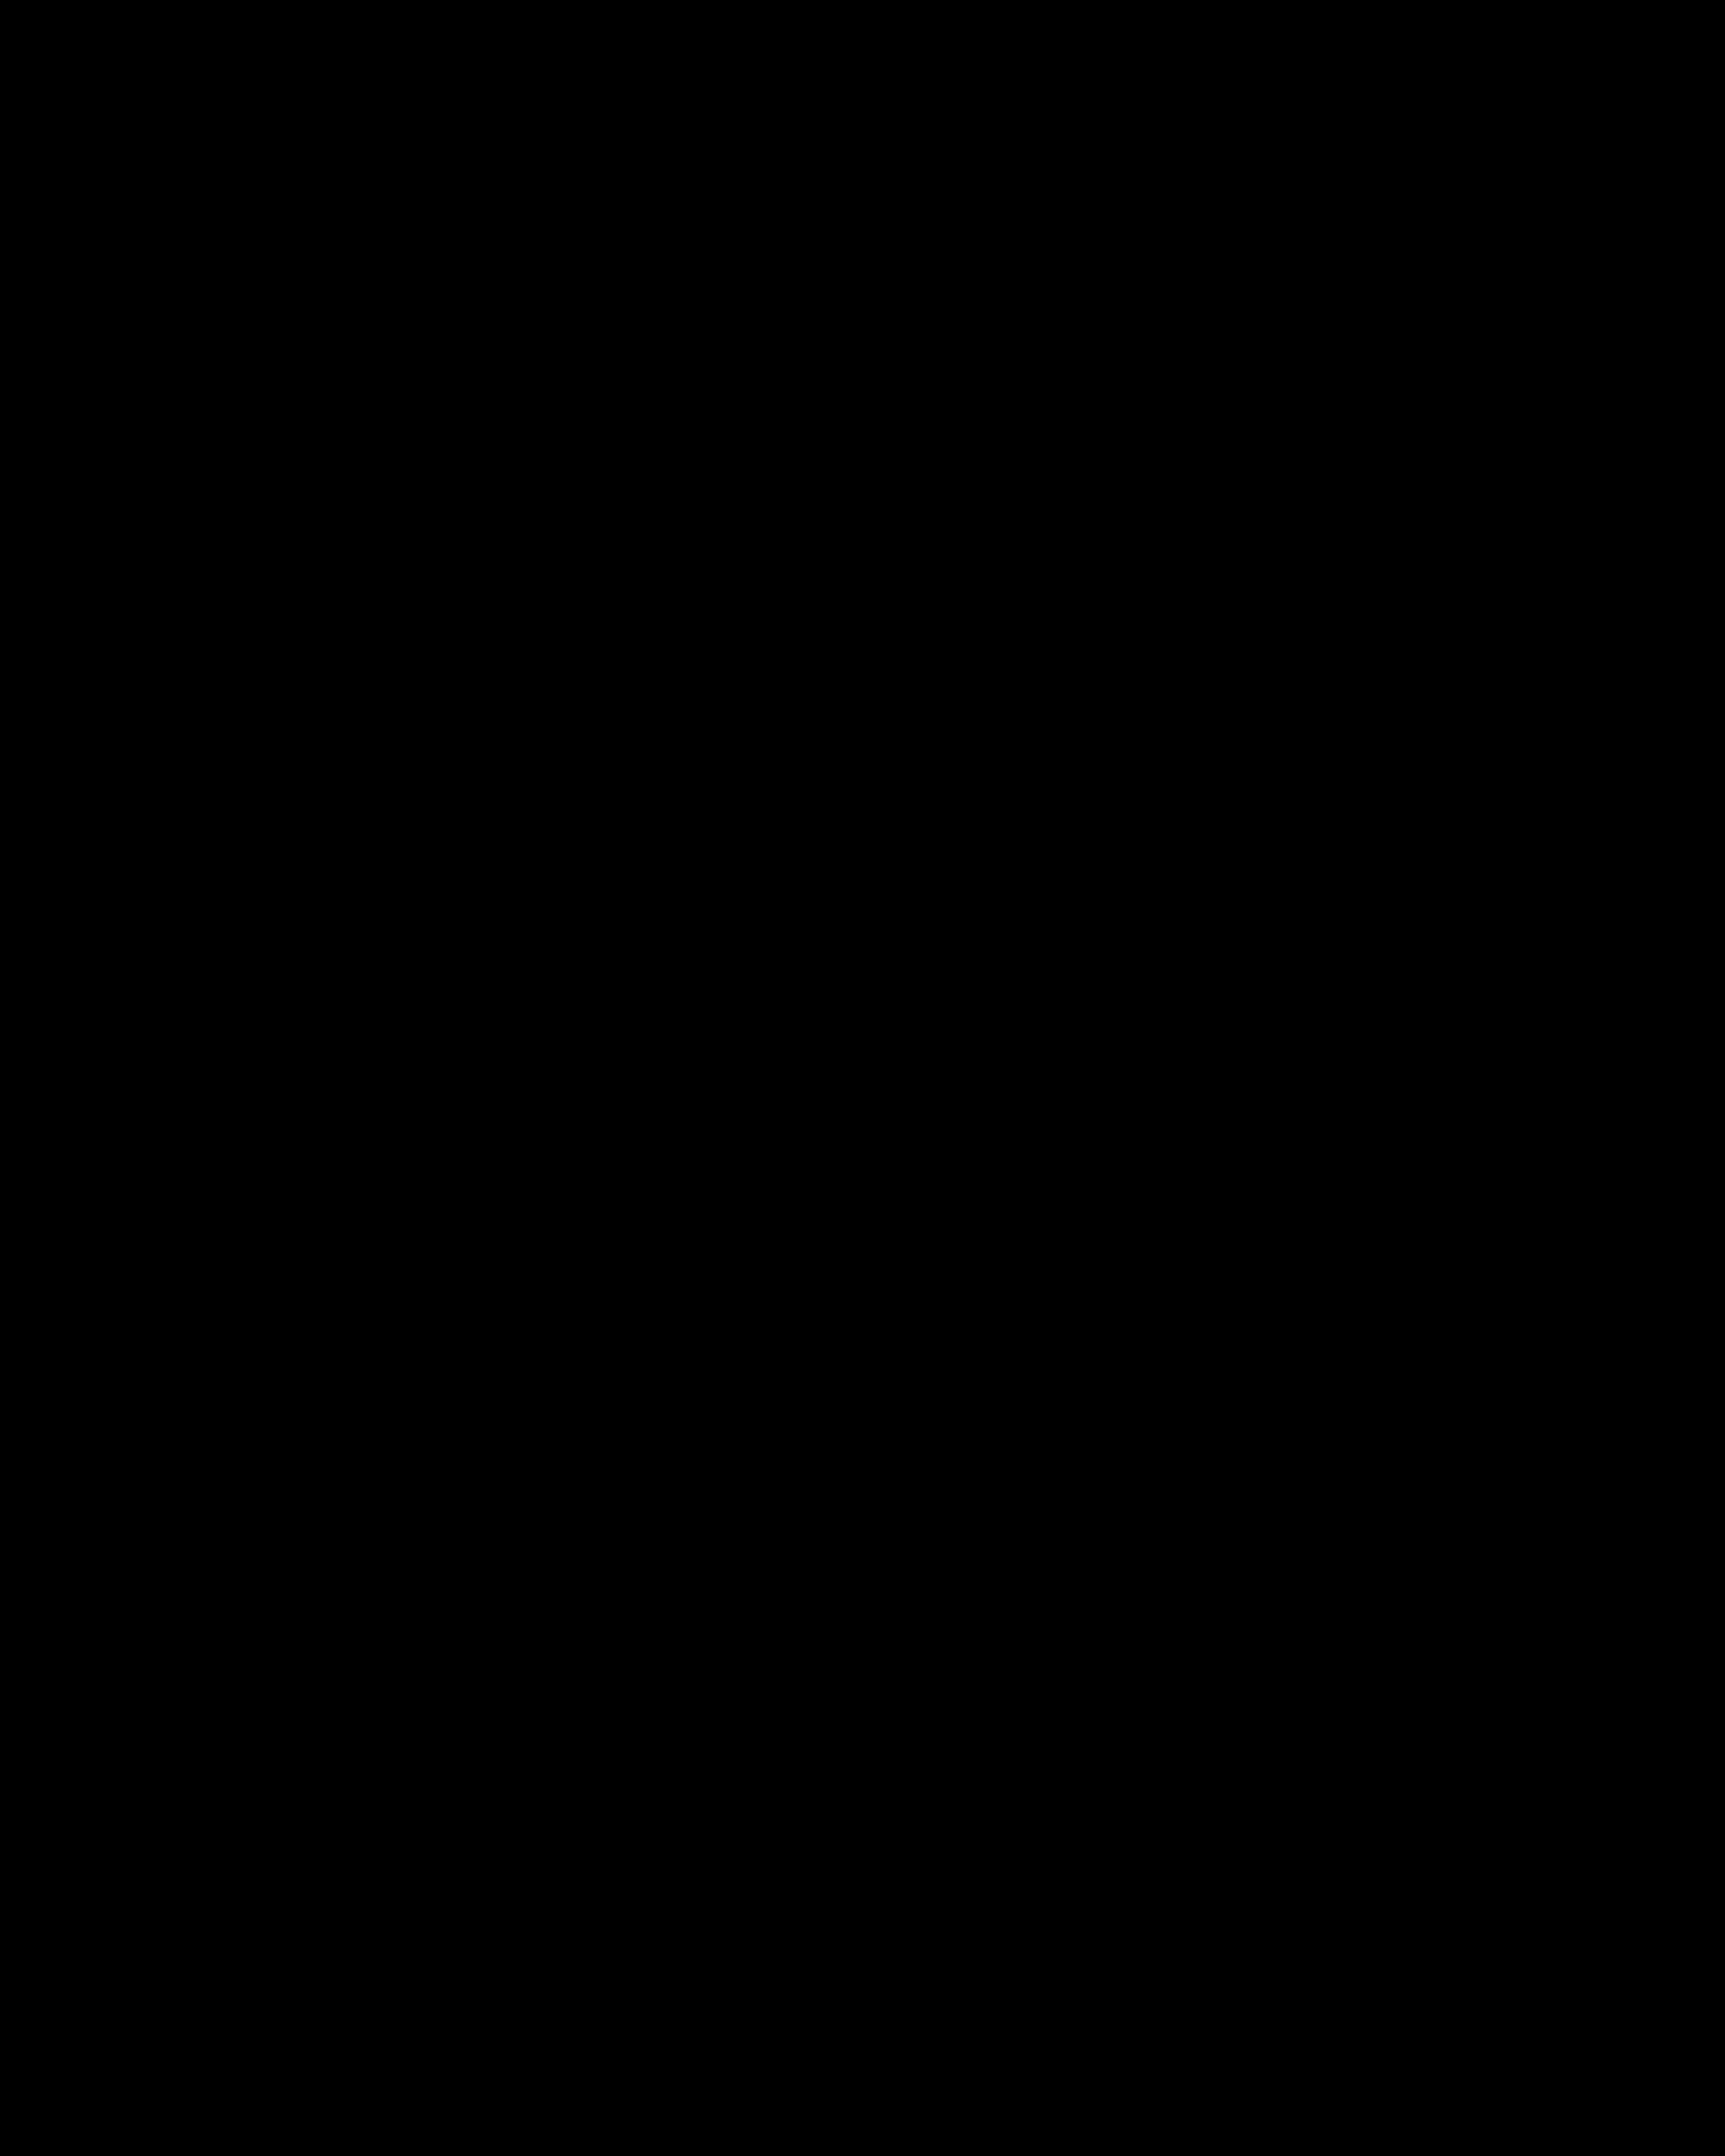 1920x2400 Clipart